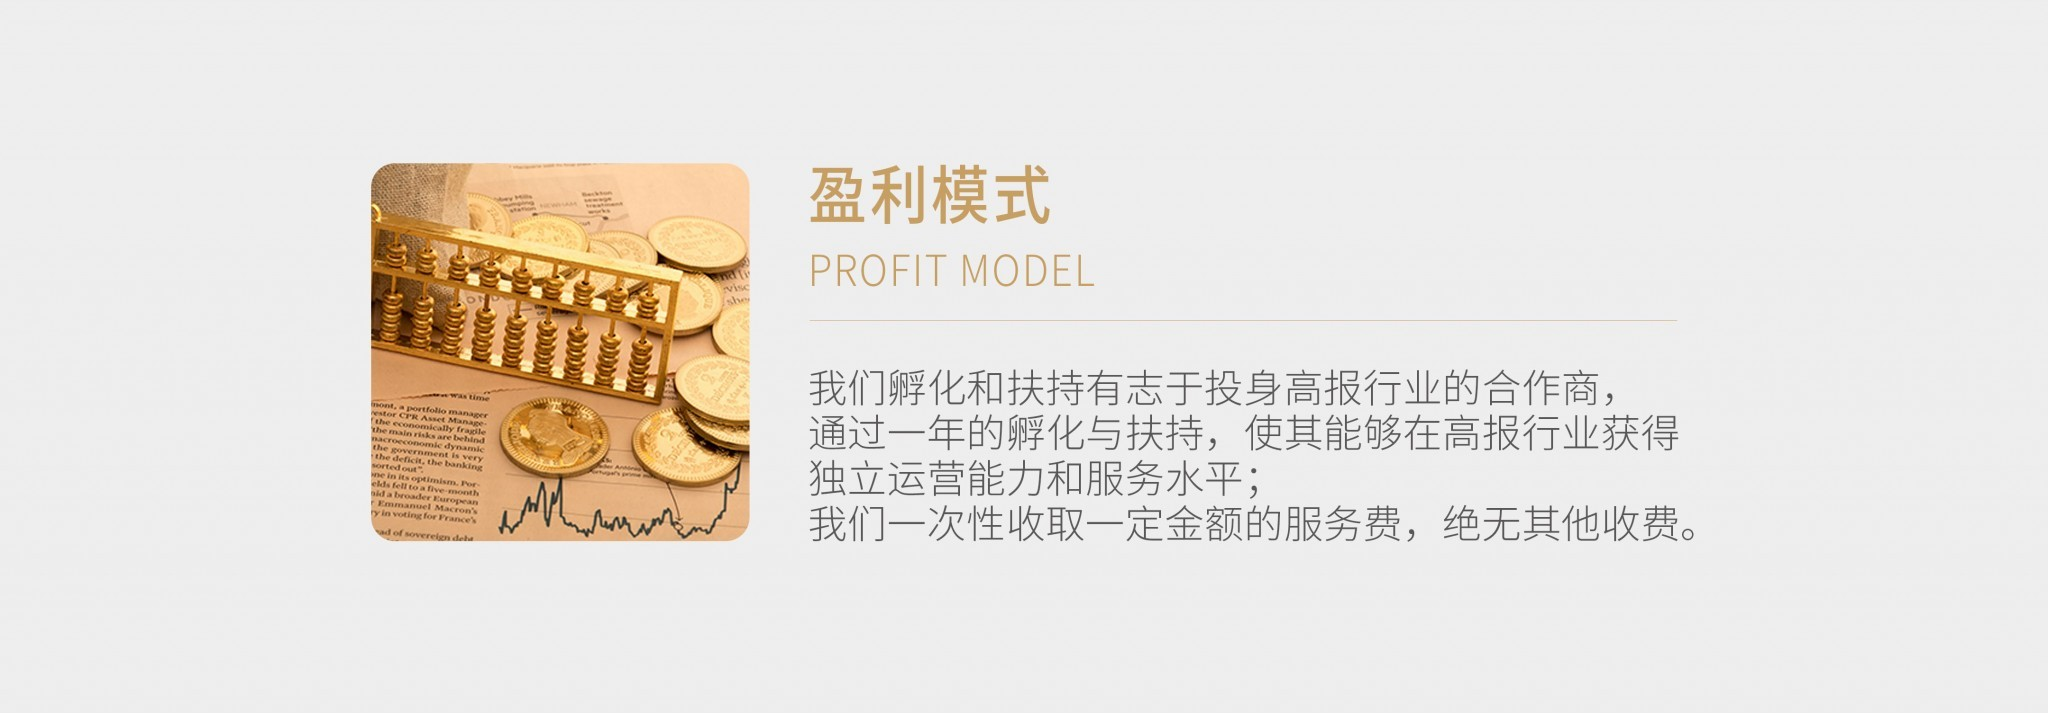 HUO--01招商模式_05